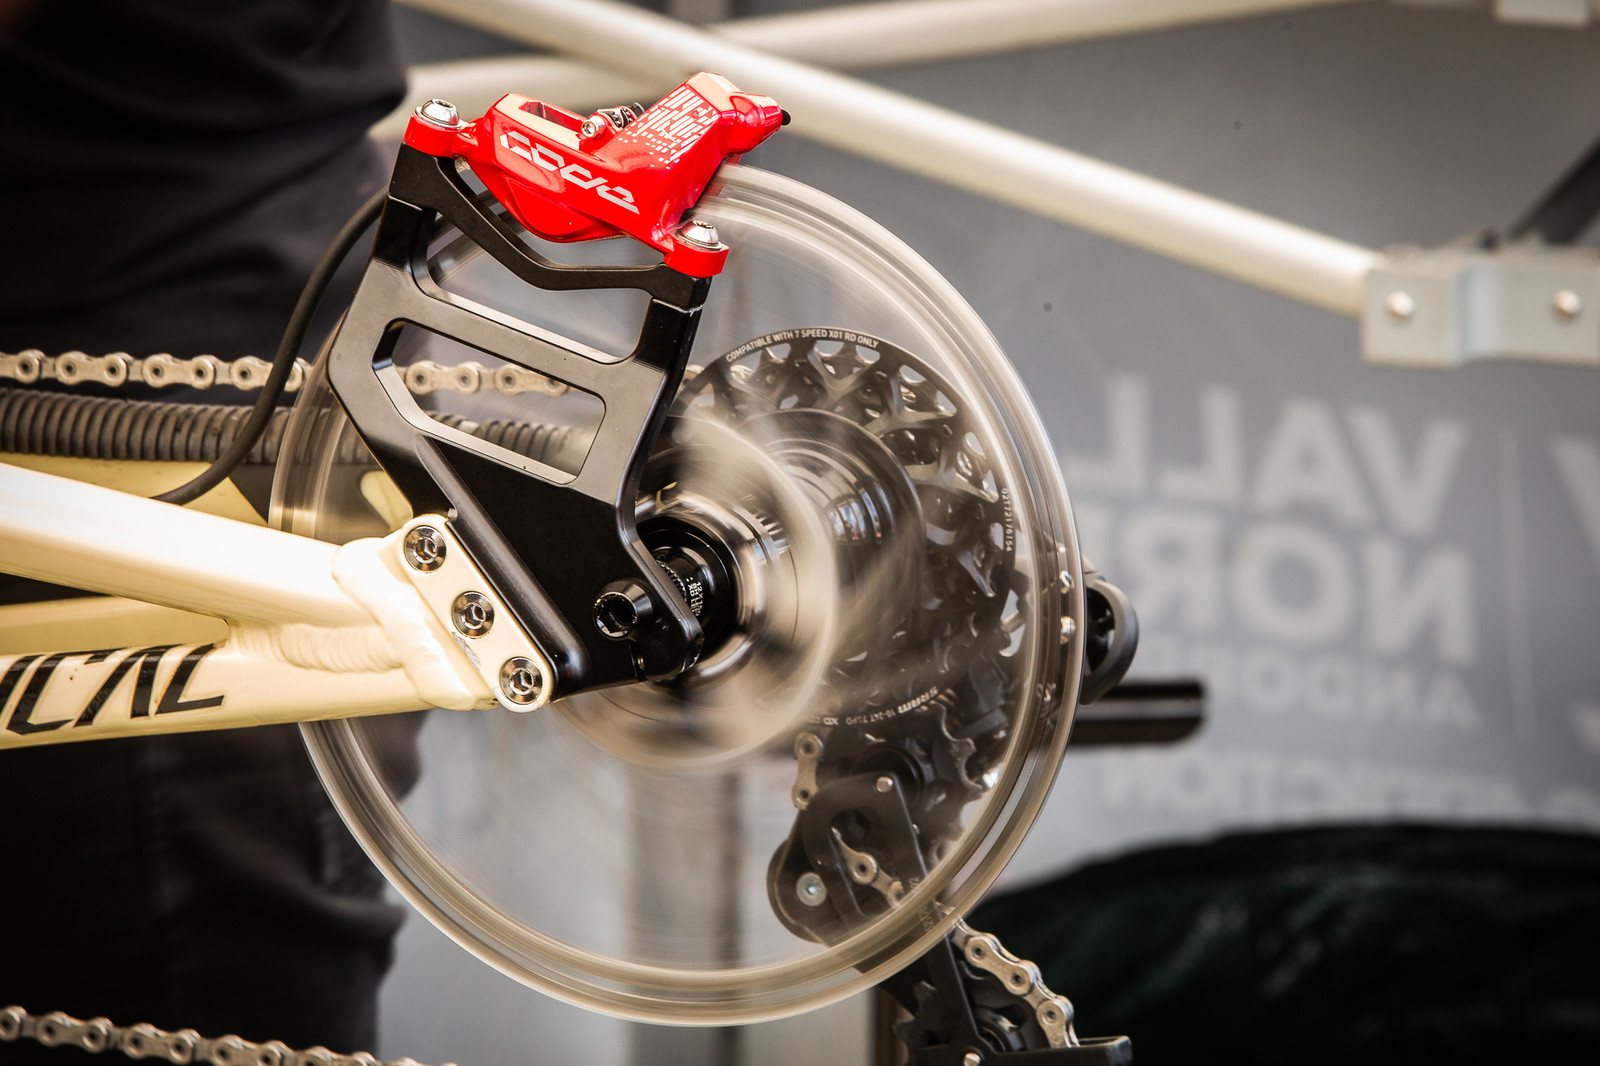 230mm Rotors - PIT BITS - Andorra World Cup Downhill - Mountain Biking Pictures - Vital MTB